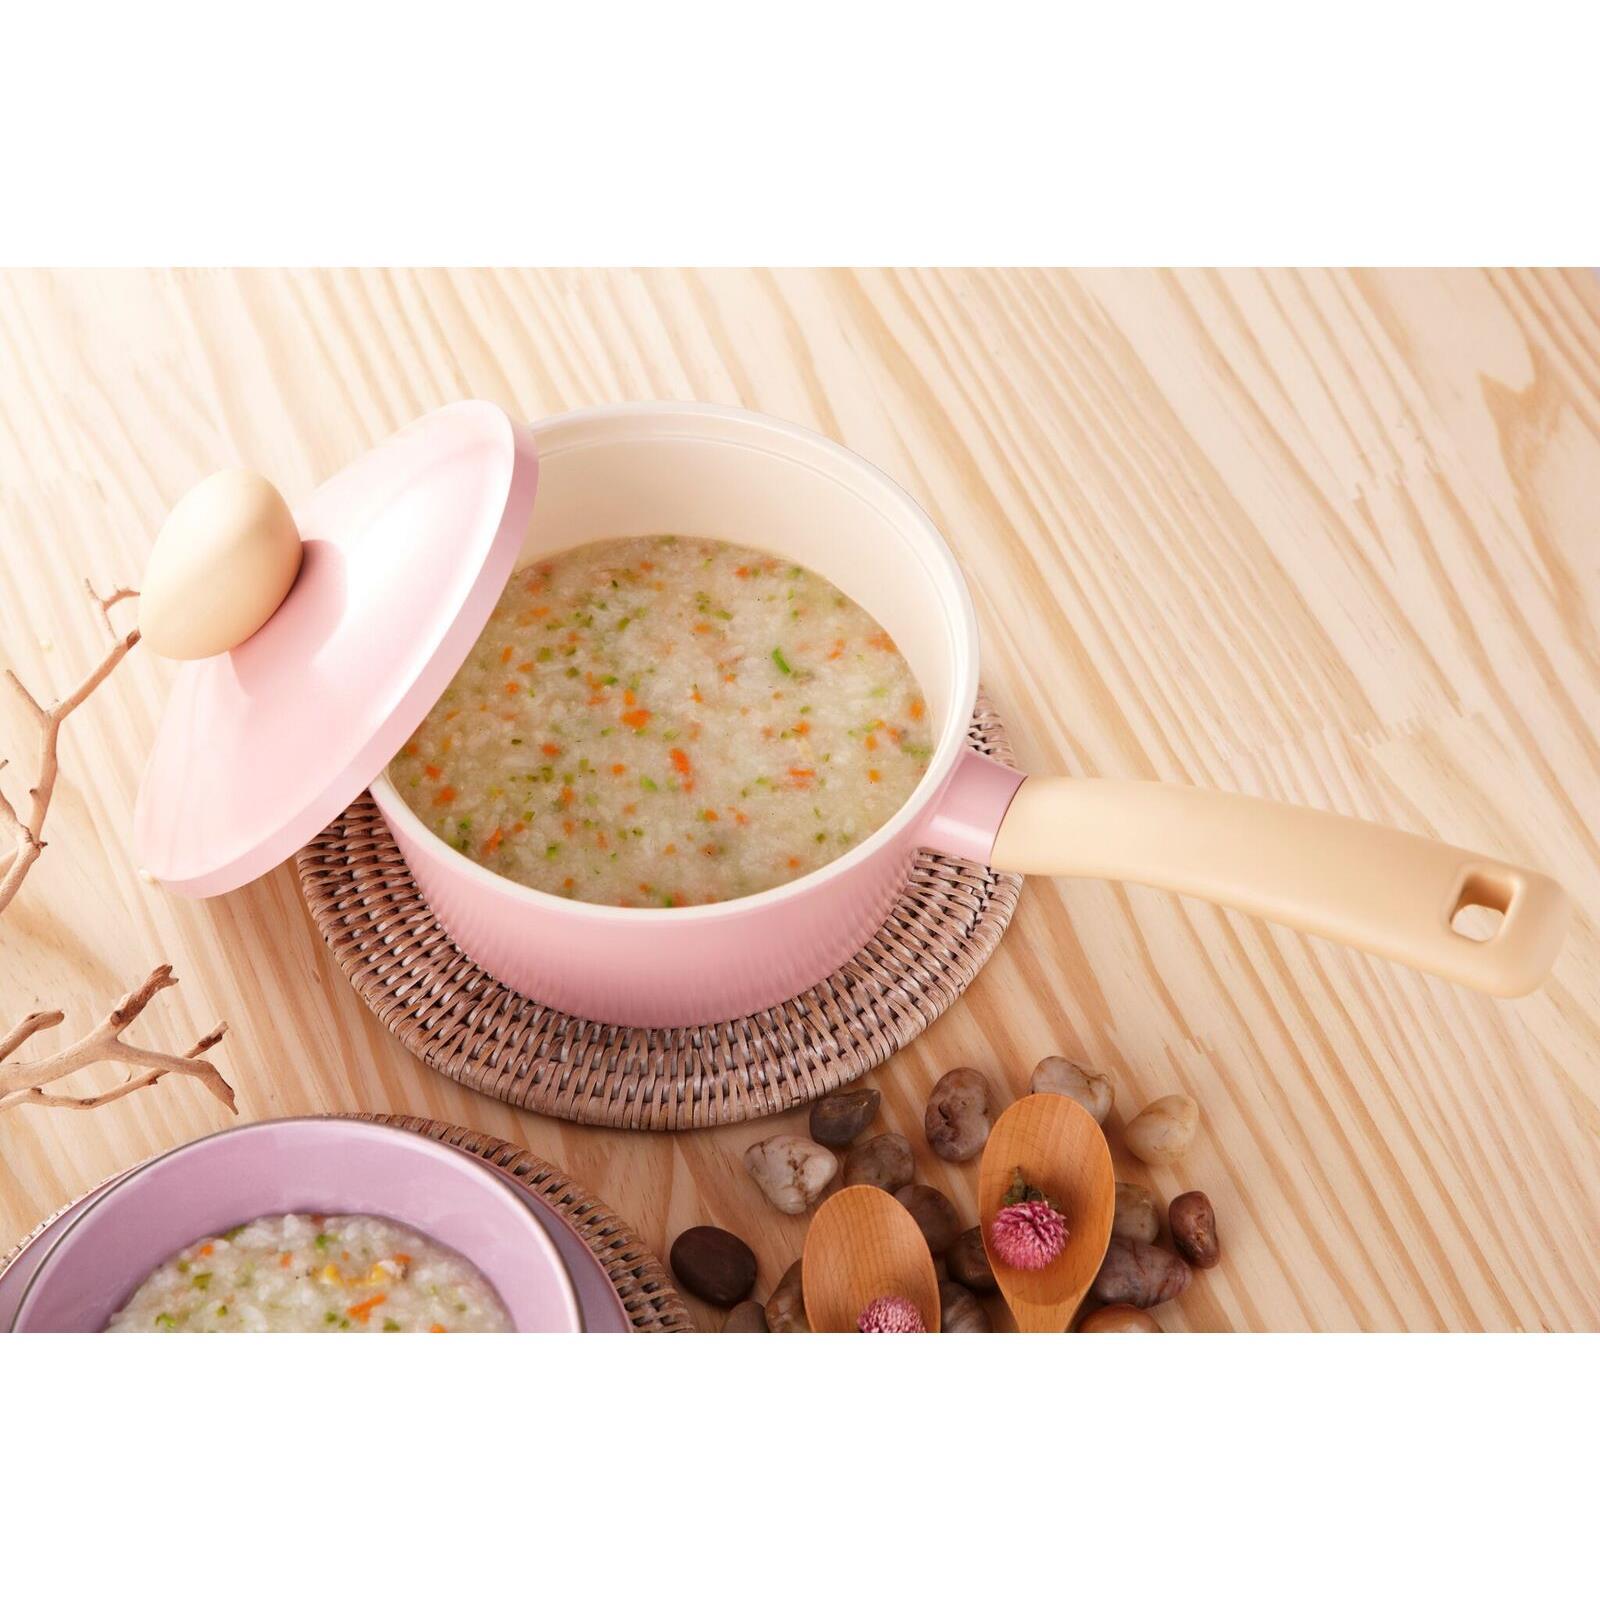 NEOFLAM 韓國原裝Retro系列 18cm不沾陶瓷單柄湯鍋 含陶瓷塗層鍋蓋 粉色